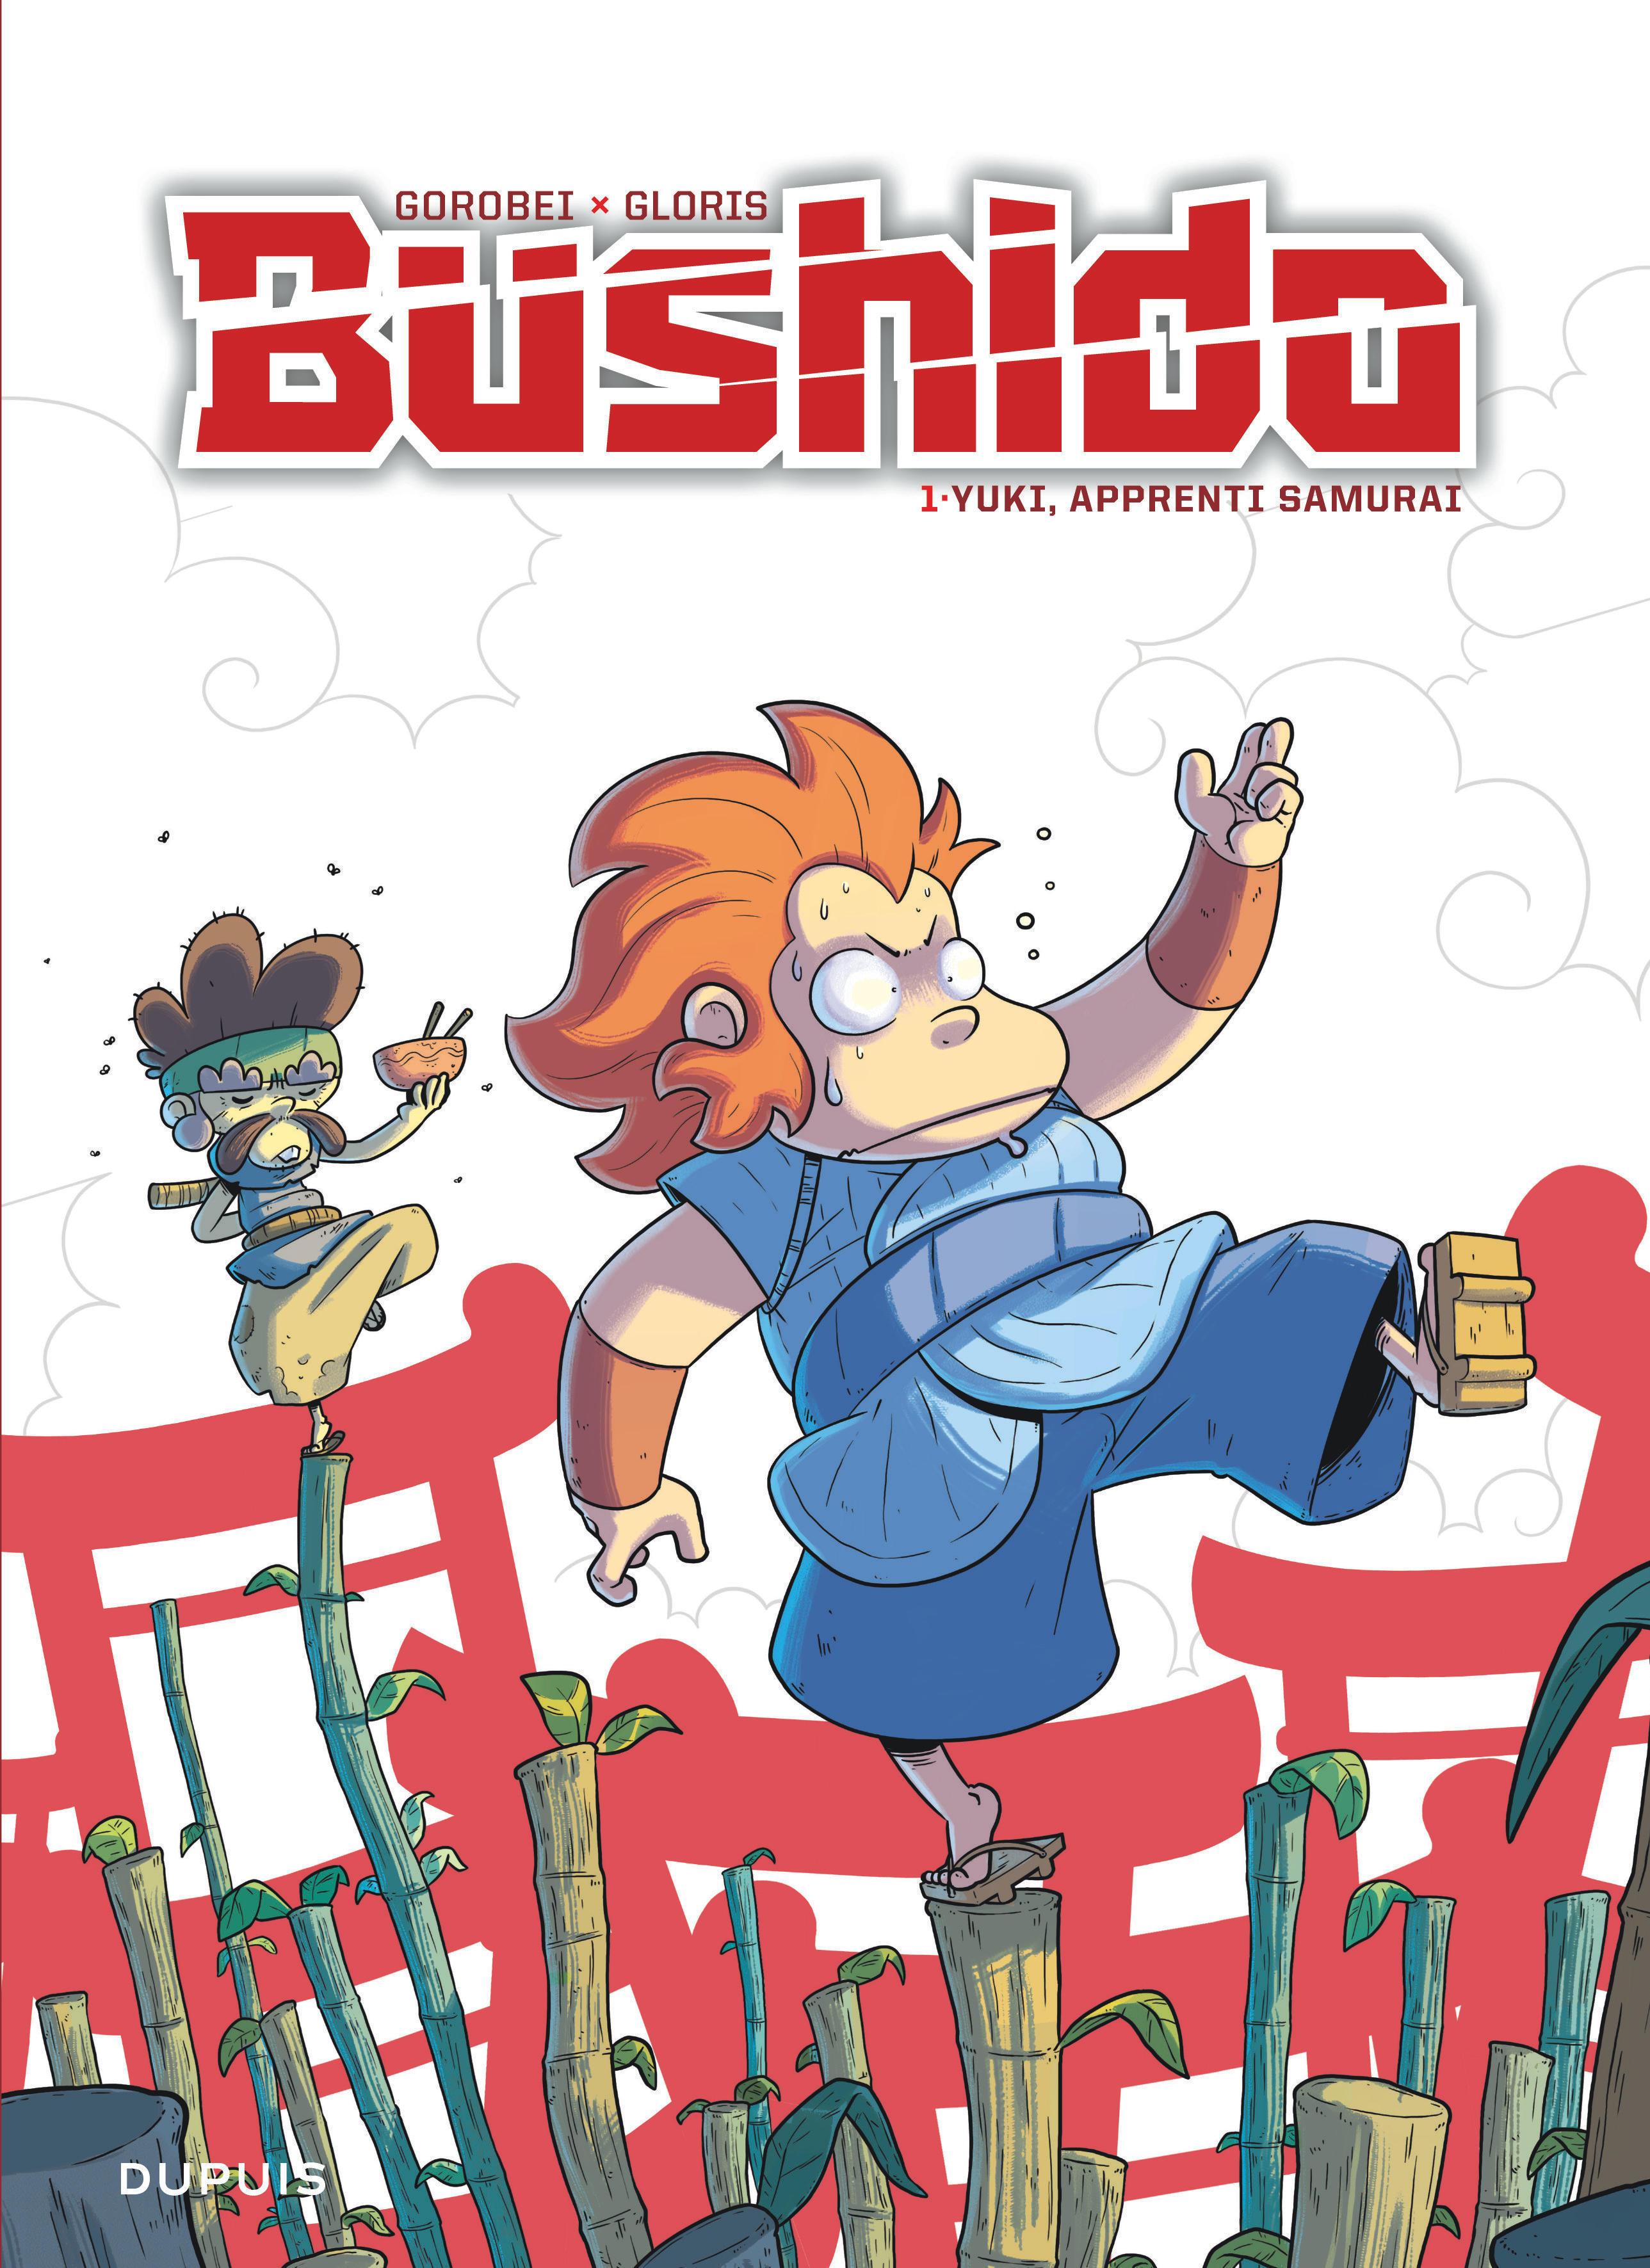 BUSHIDO T1 BUSHIDO - TOME 1 - YUKI, APPRENTI SAMURAI  REEDITION (PRIX REDUIT)